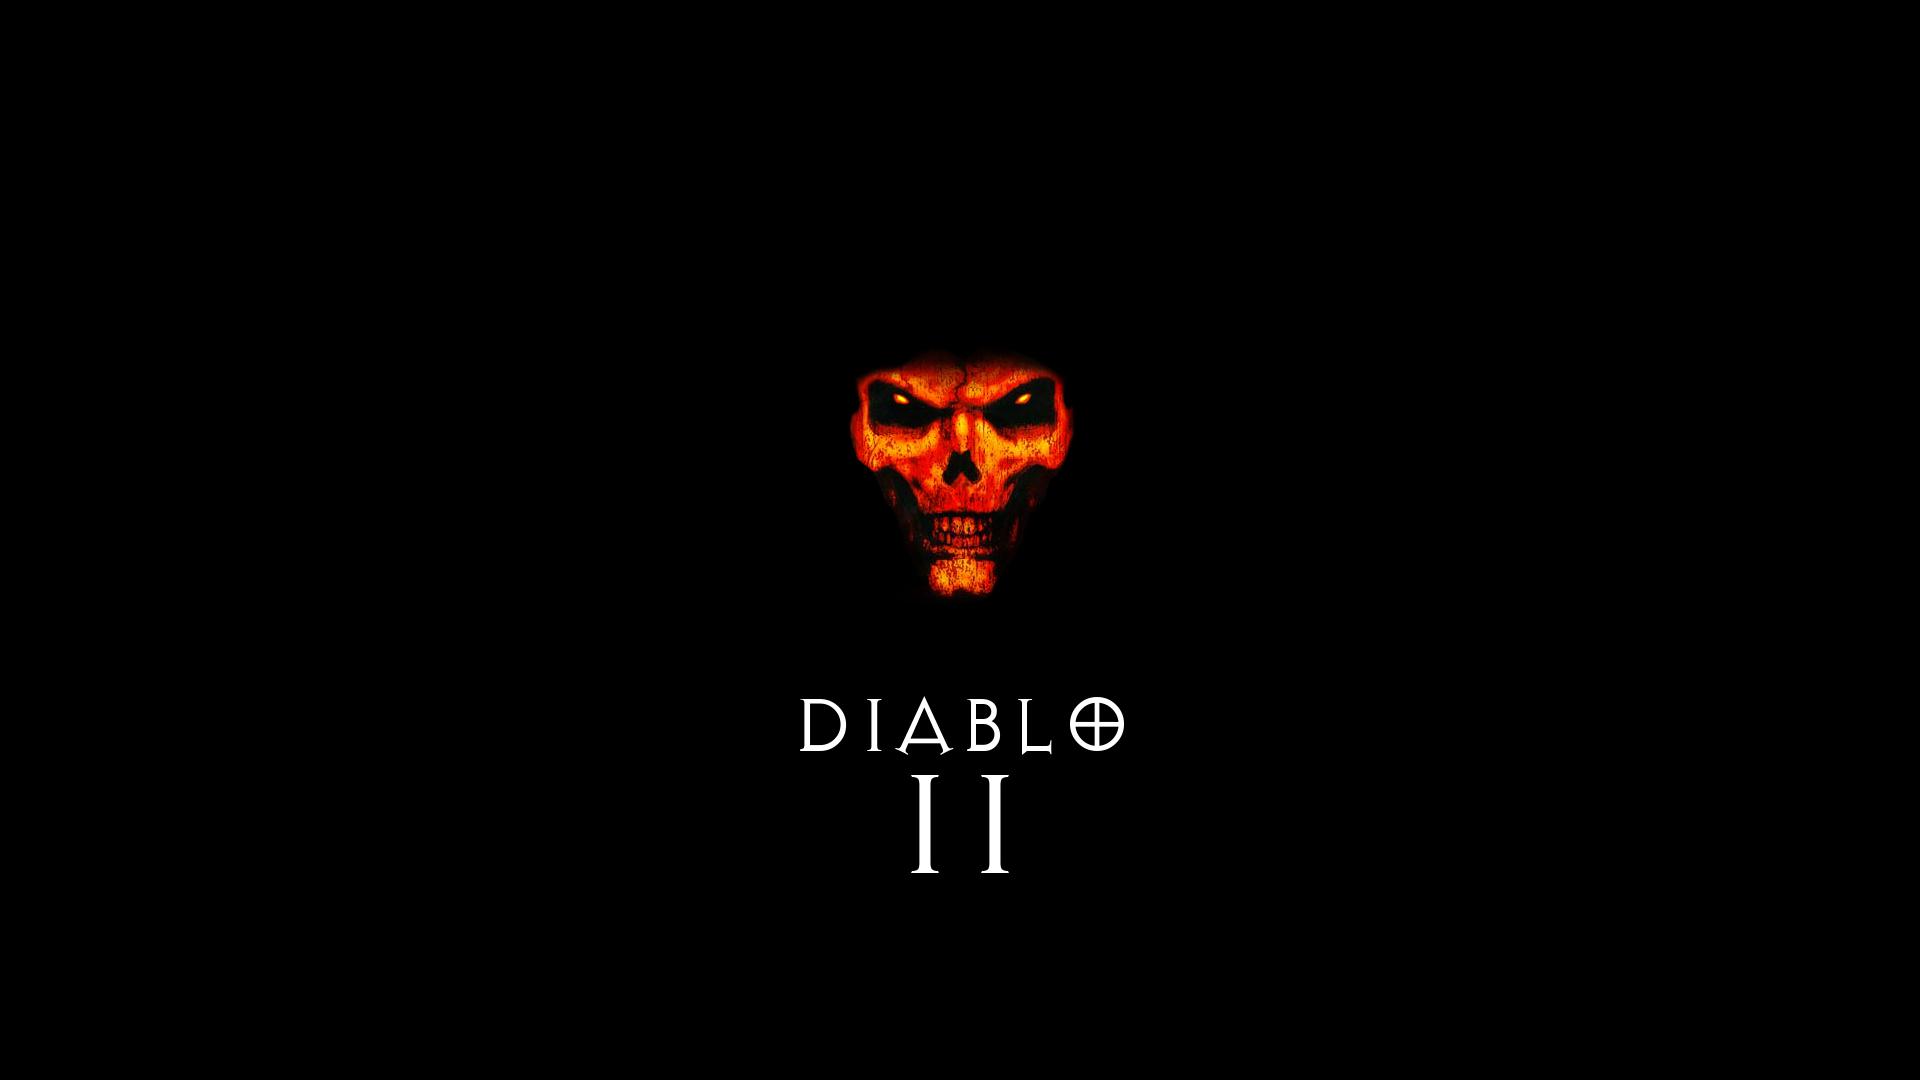 Minimalistic Diablo 2 Wallpaper by Wambologic Minimalistic Diablo 2 Wallpaper by Wambologic